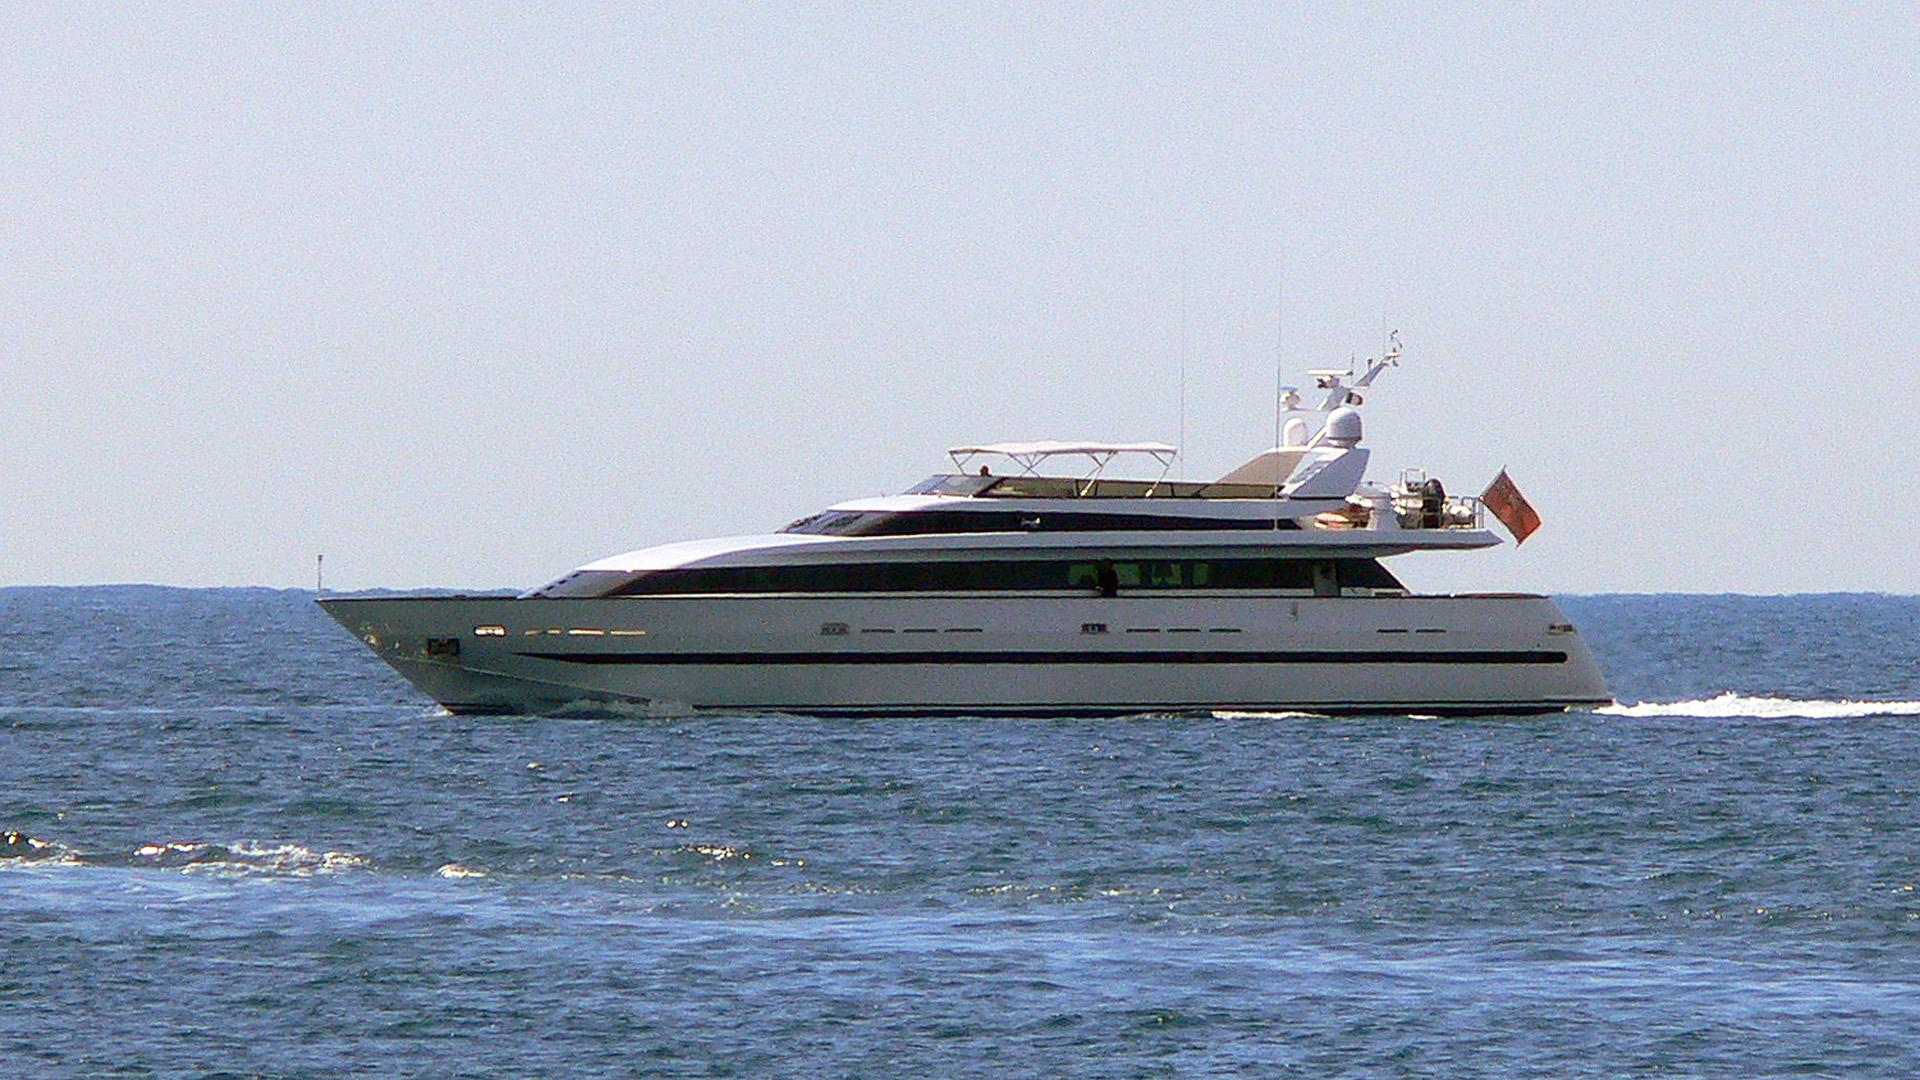 christo-he-motor-yacht-baglietto-33m-1991-running-profile